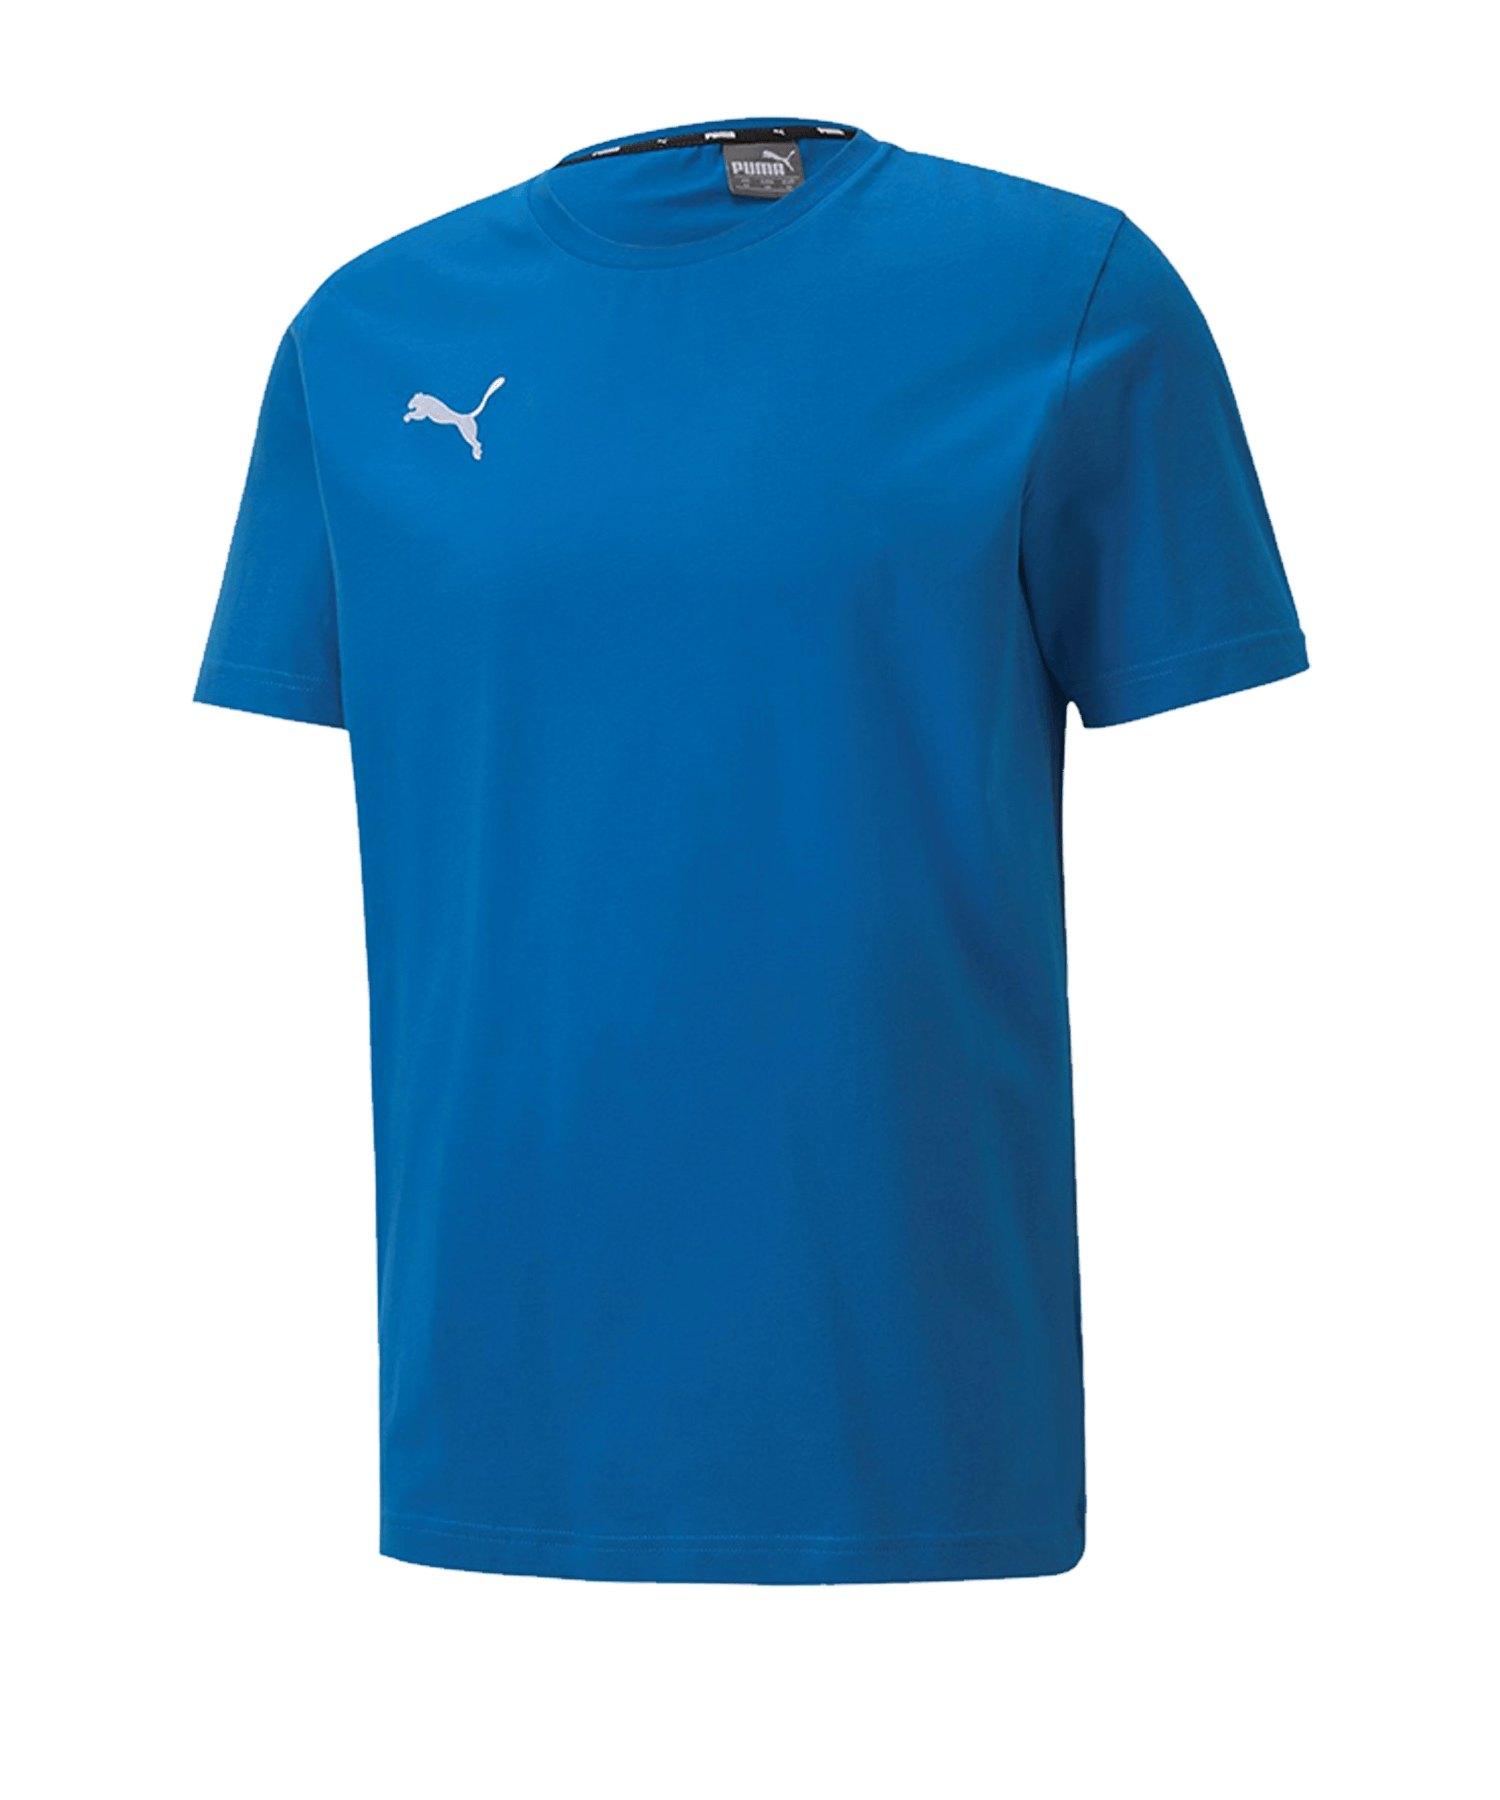 PUMA teamGOAL 23 Casuals Tee T-Shirt Blau F02 - blau